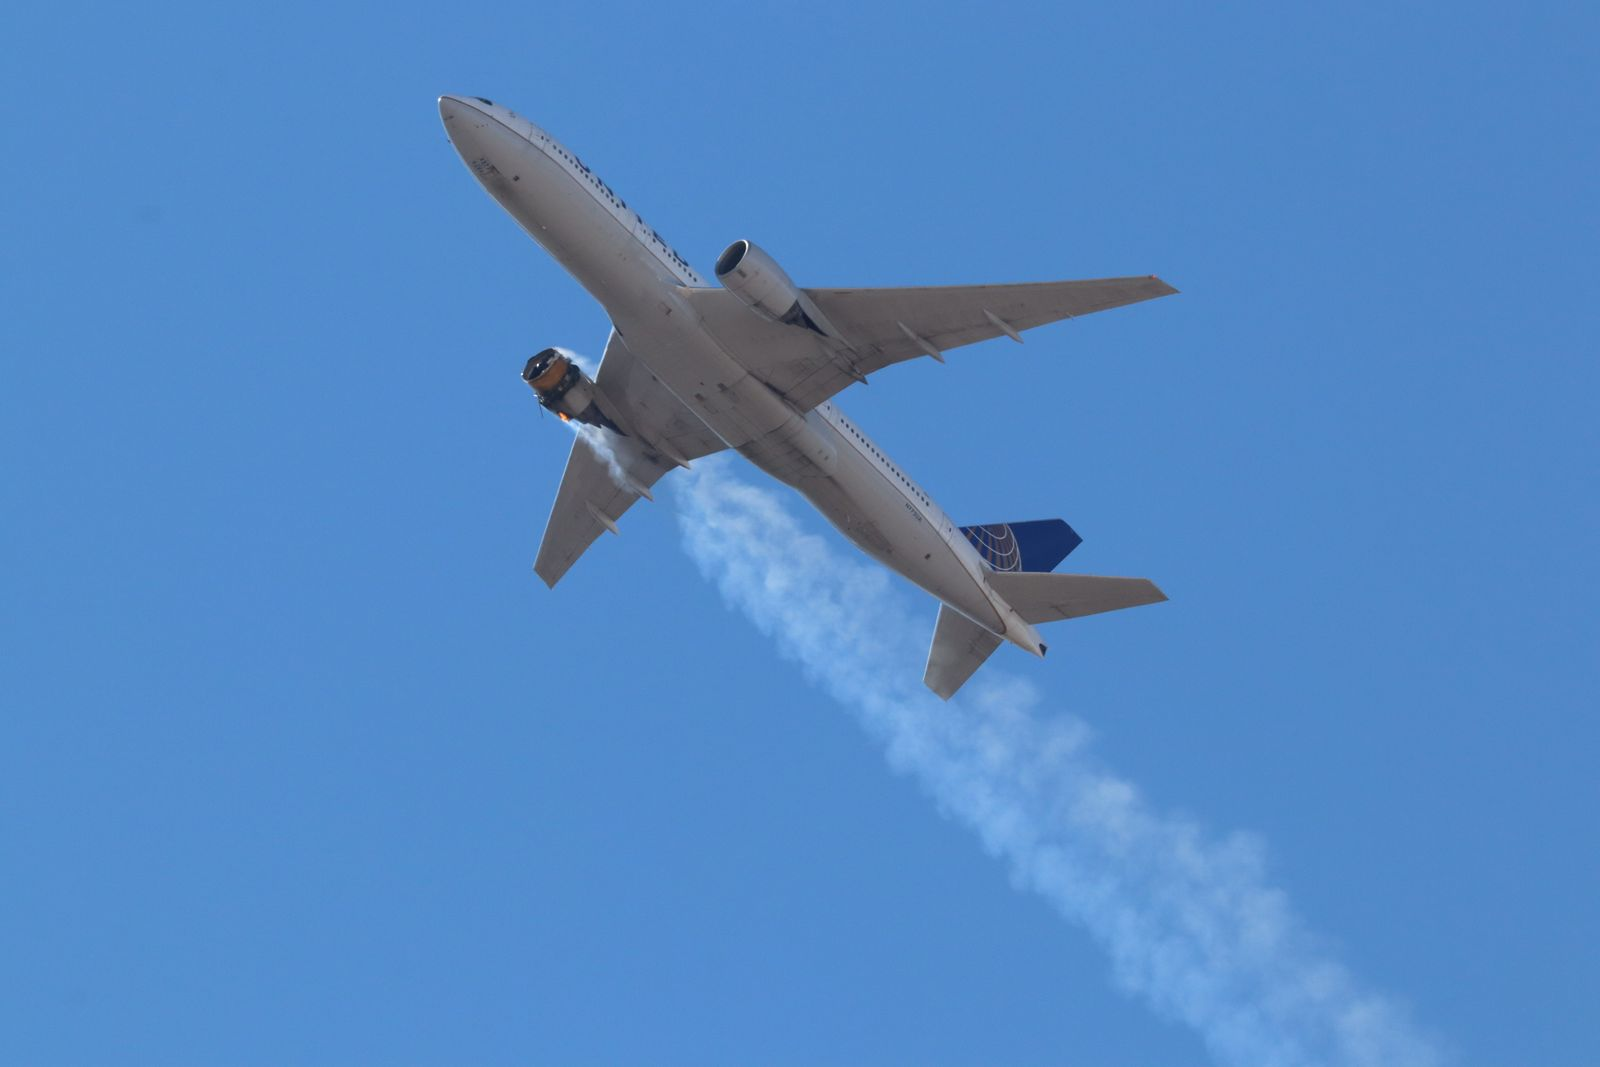 Debris falls from a plane over Broomfield, Denver, USA - 21 Feb 2021